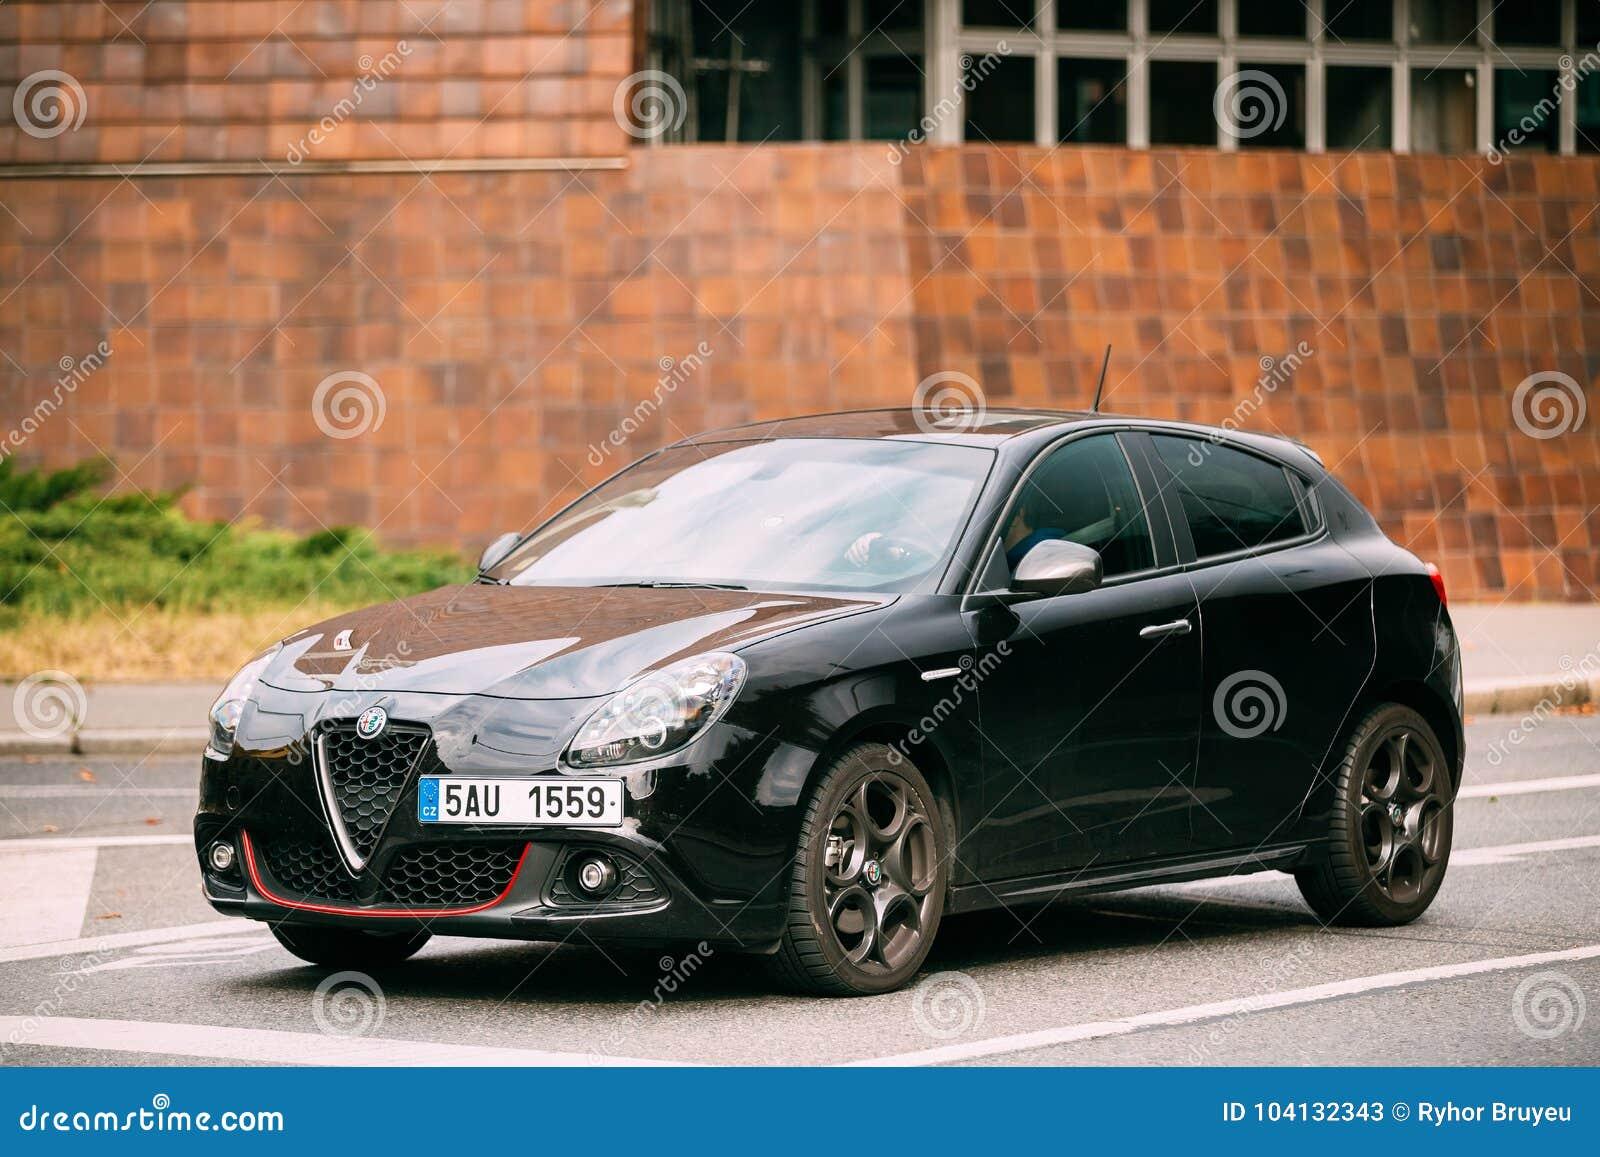 Side View Of Alfa Romeo Giulietta Veloce 940 Car Of Black Metallic Editorial Stock Photo Image Of Modern Outdoor 104132343